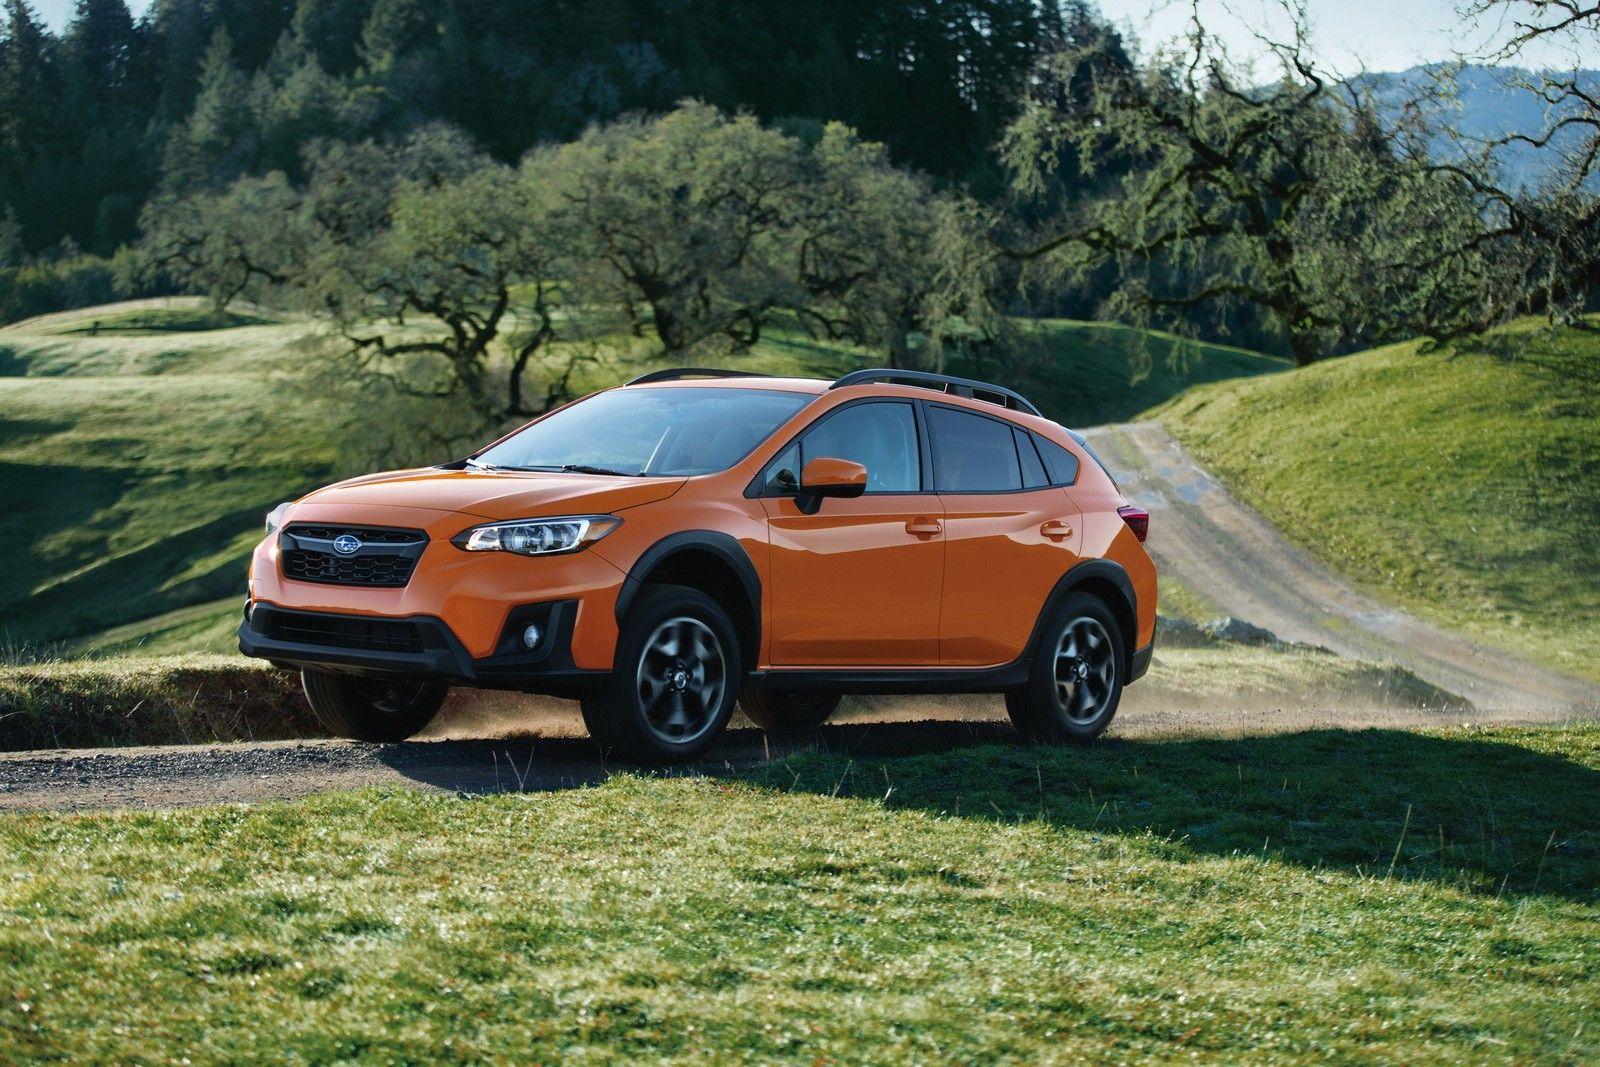 2019 Subaru Crosstrek Hybrid Confirmed With Toyota S Plug In Hybrid Technology Subaru Subaru Impreza Carros